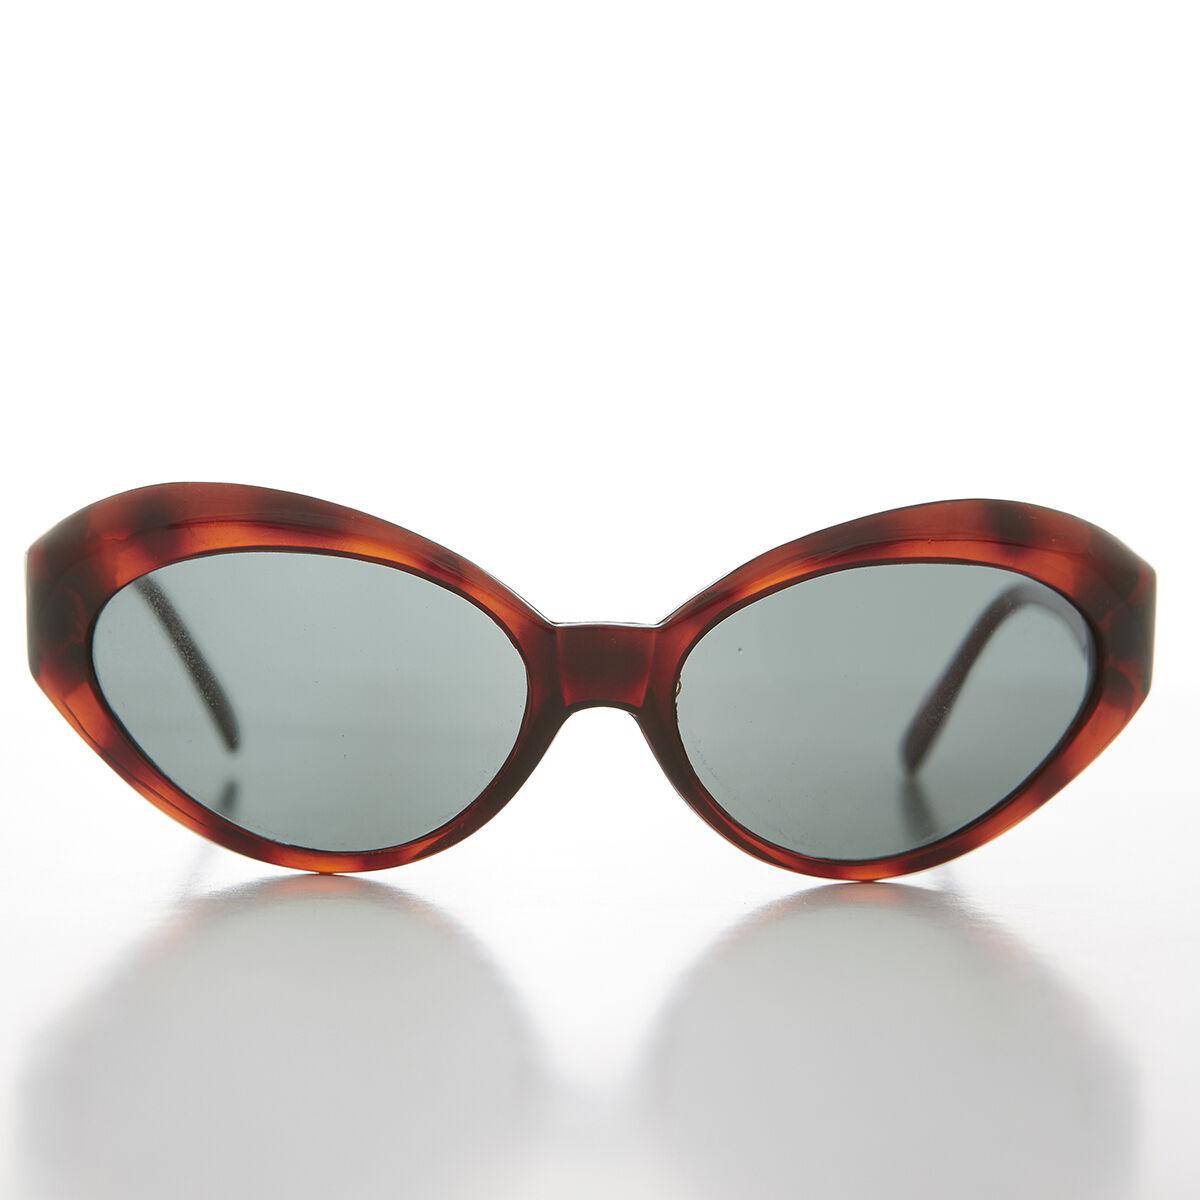 Land Tortoise Frame Bent Cat Eye Sunglasses 90s Retro with Glass Lens --show original title